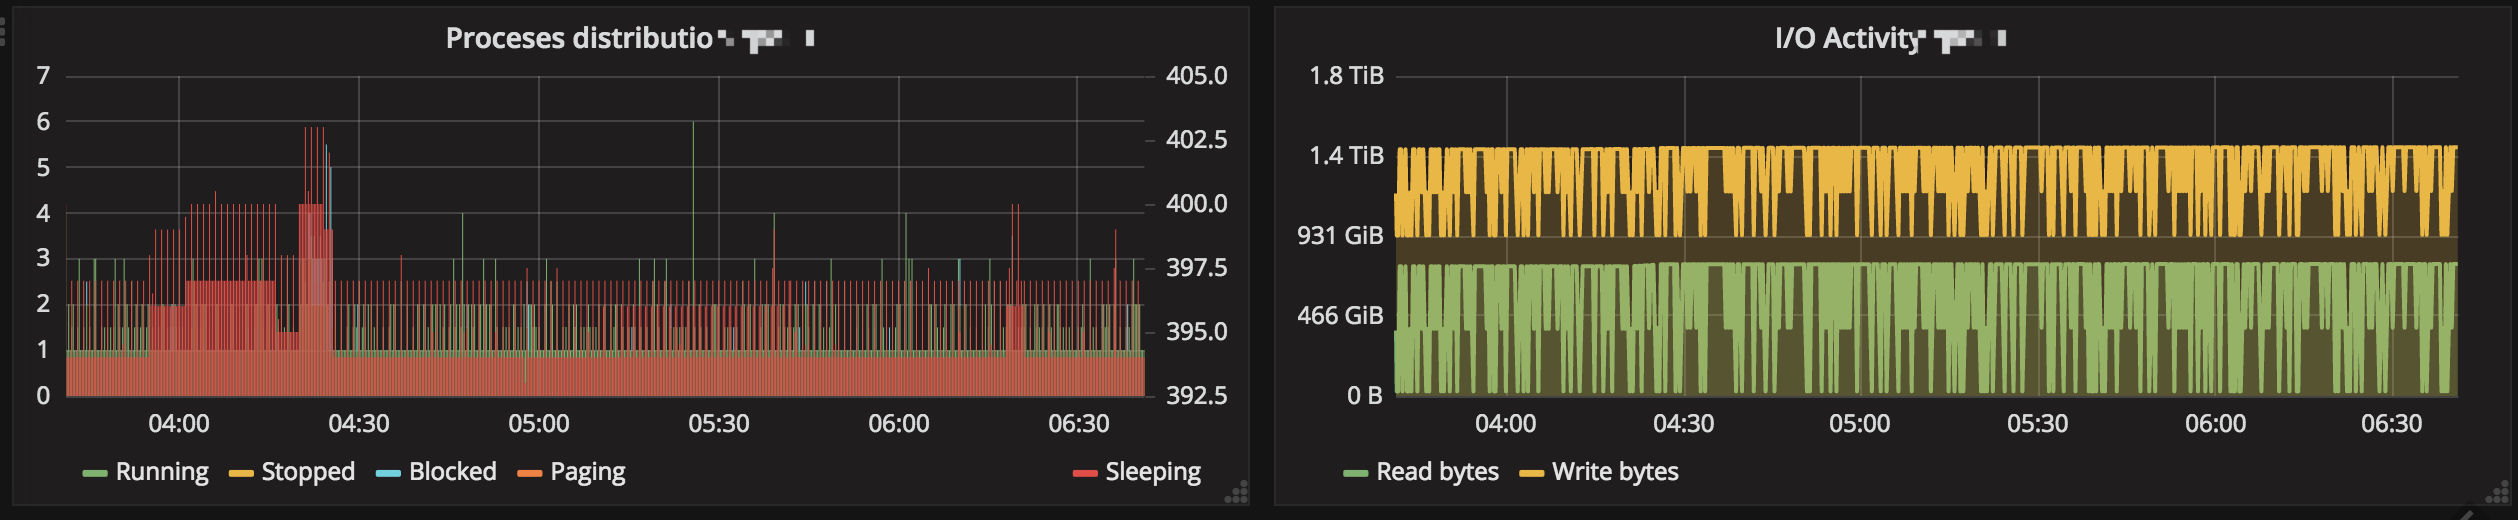 server_monitor02